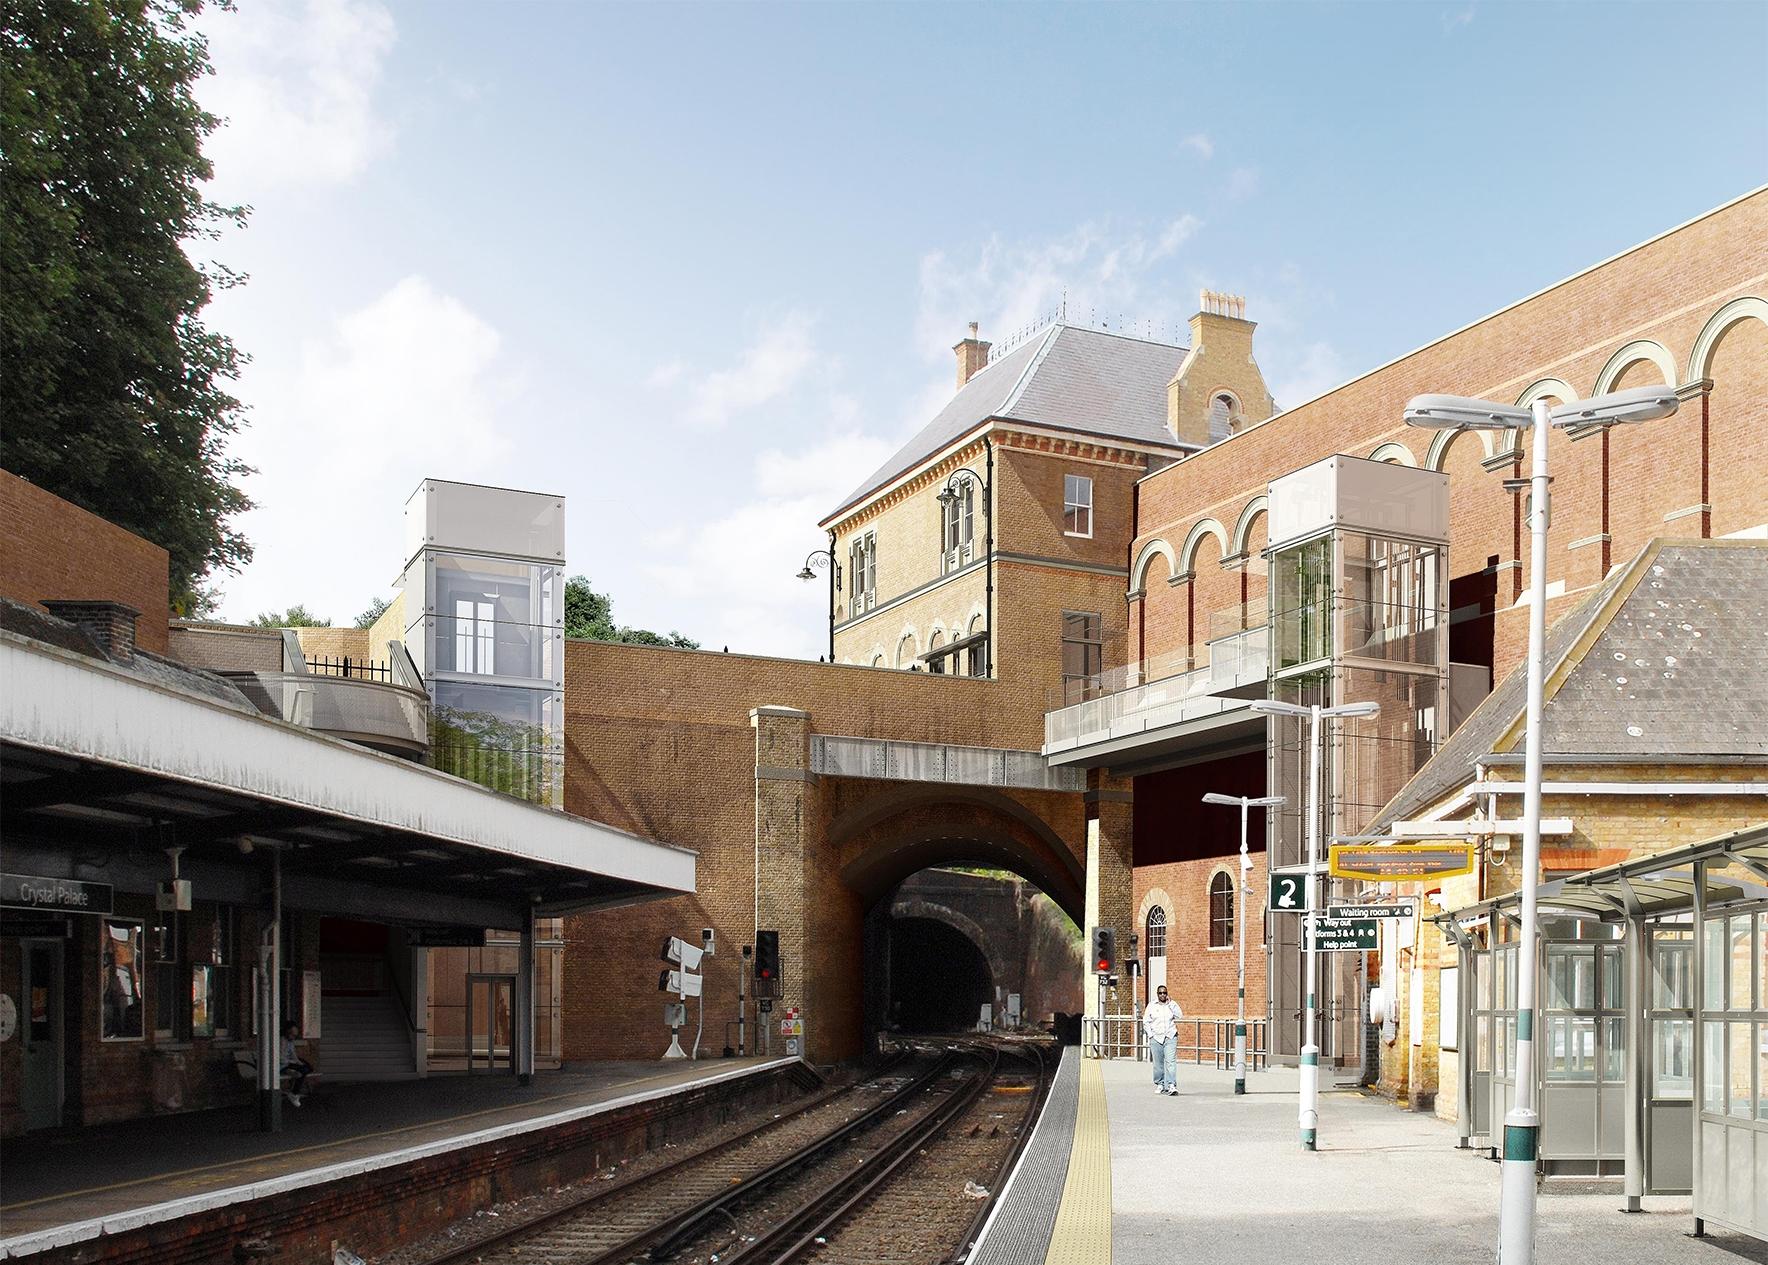 2 Crystal Palace Station